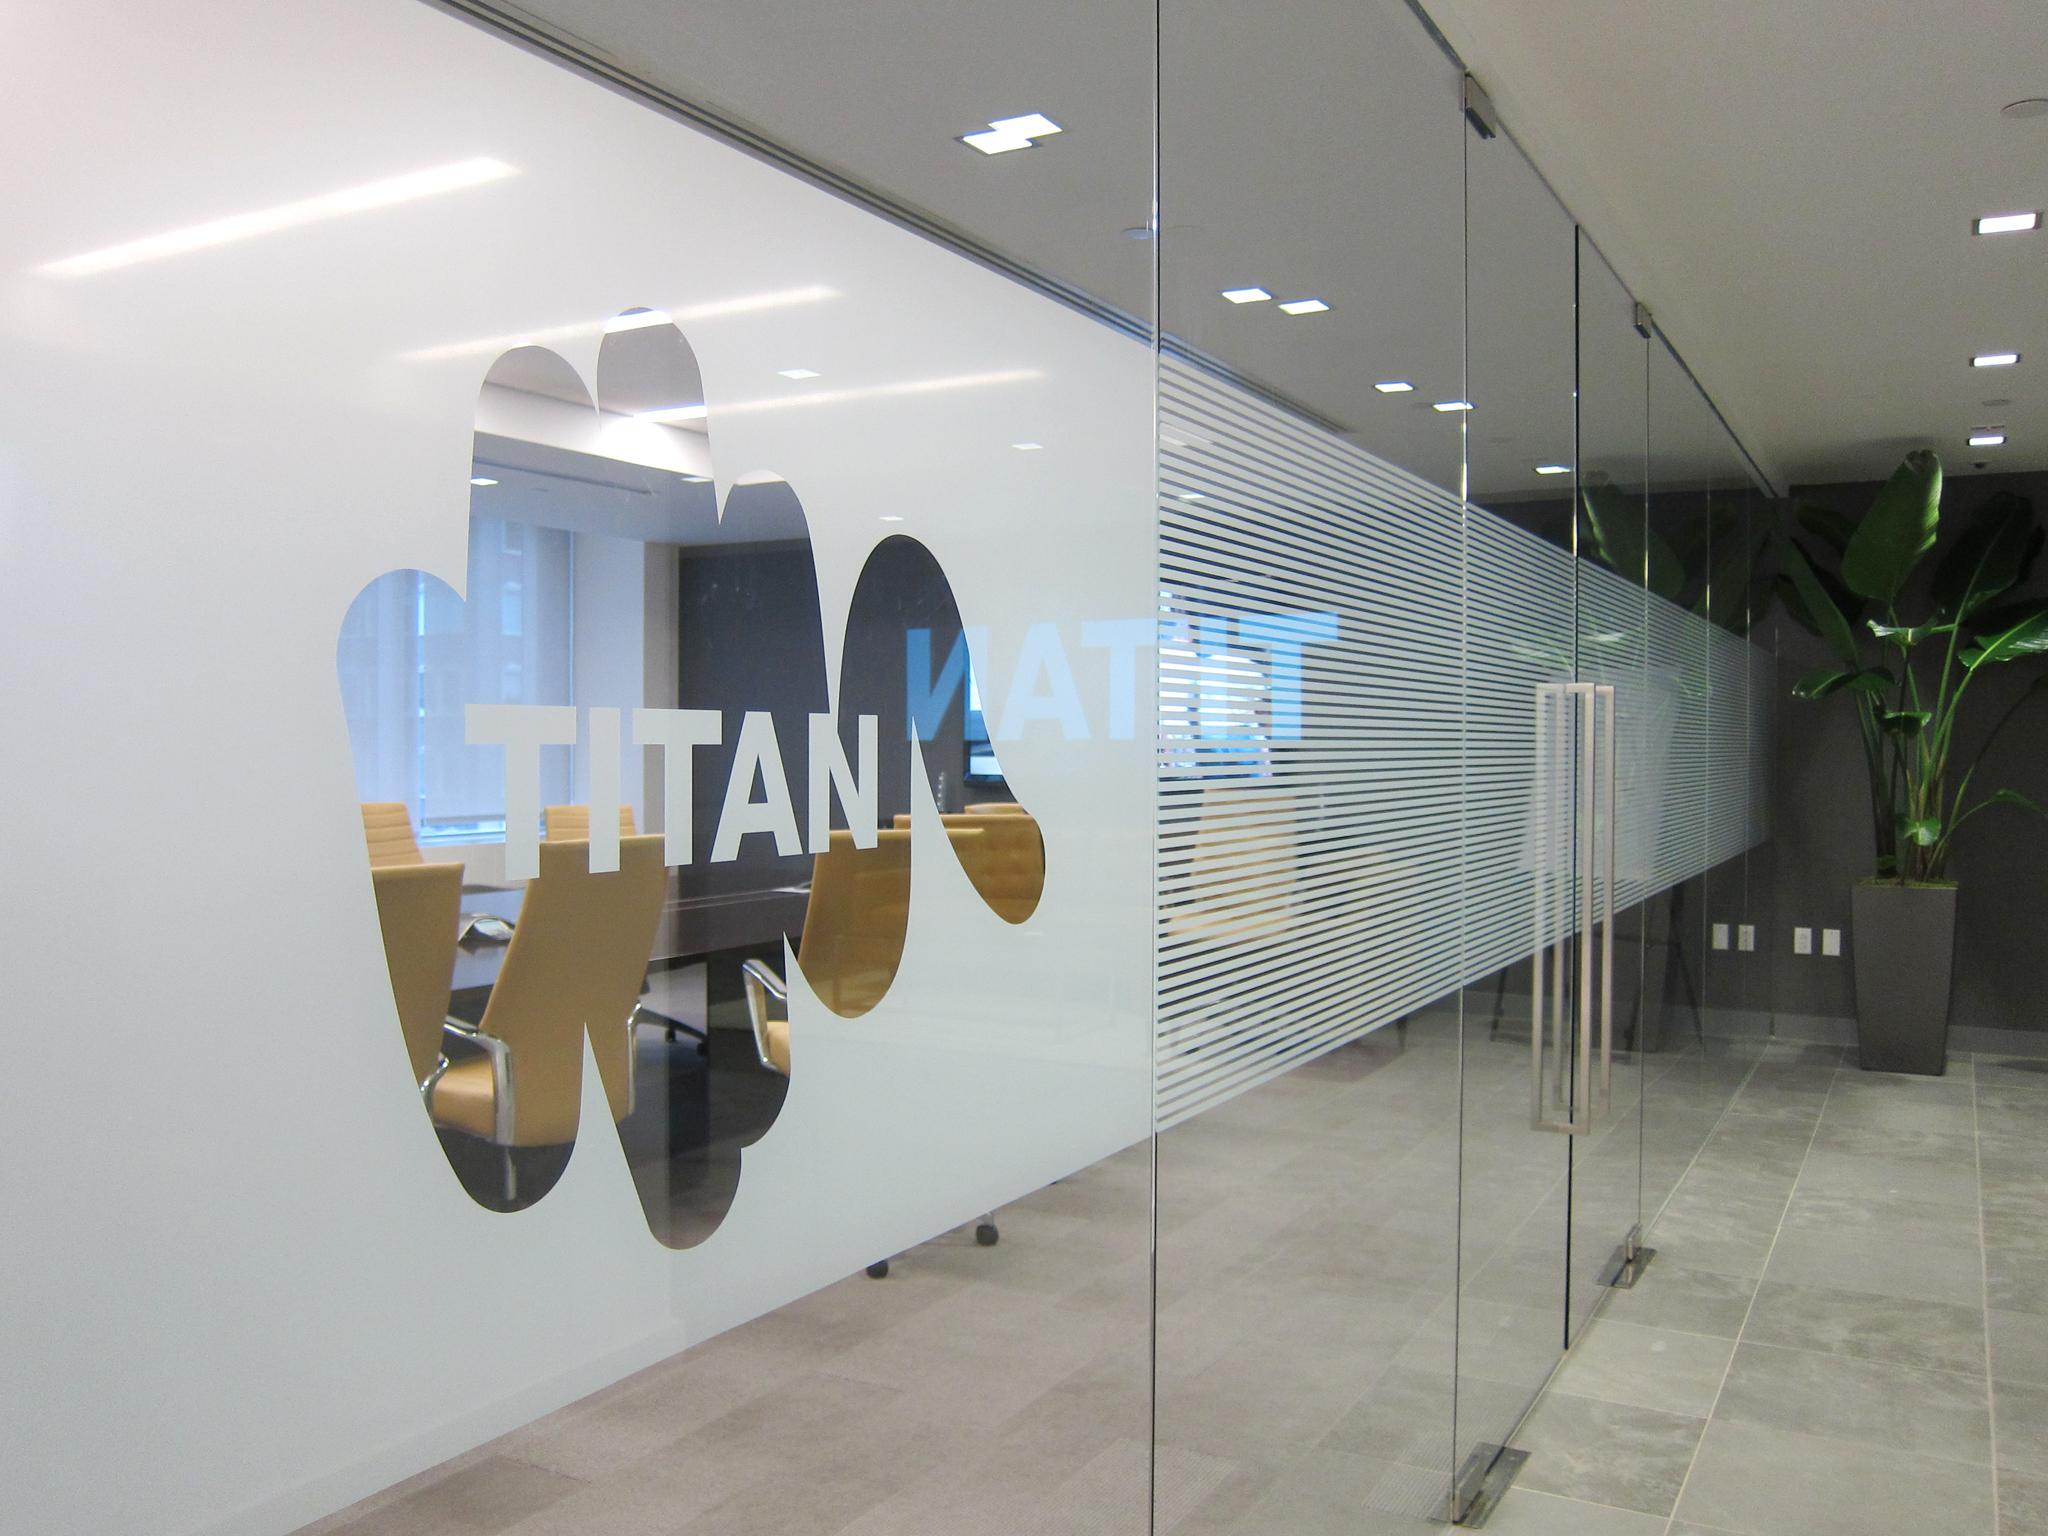 titan_sm4